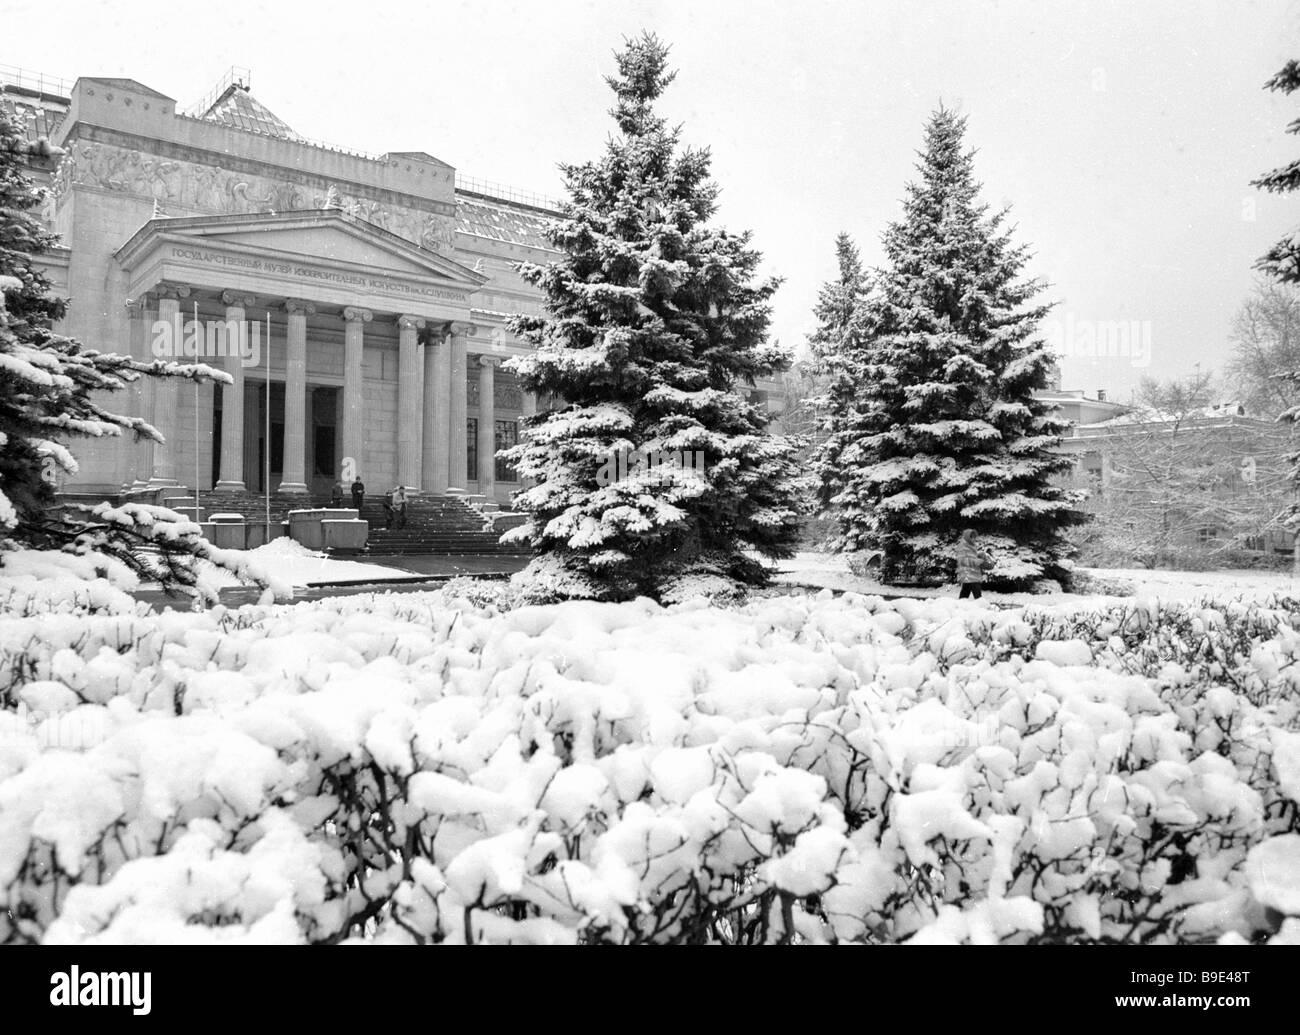 Alexander Pushkin Museum of Fine Arts - Stock Image